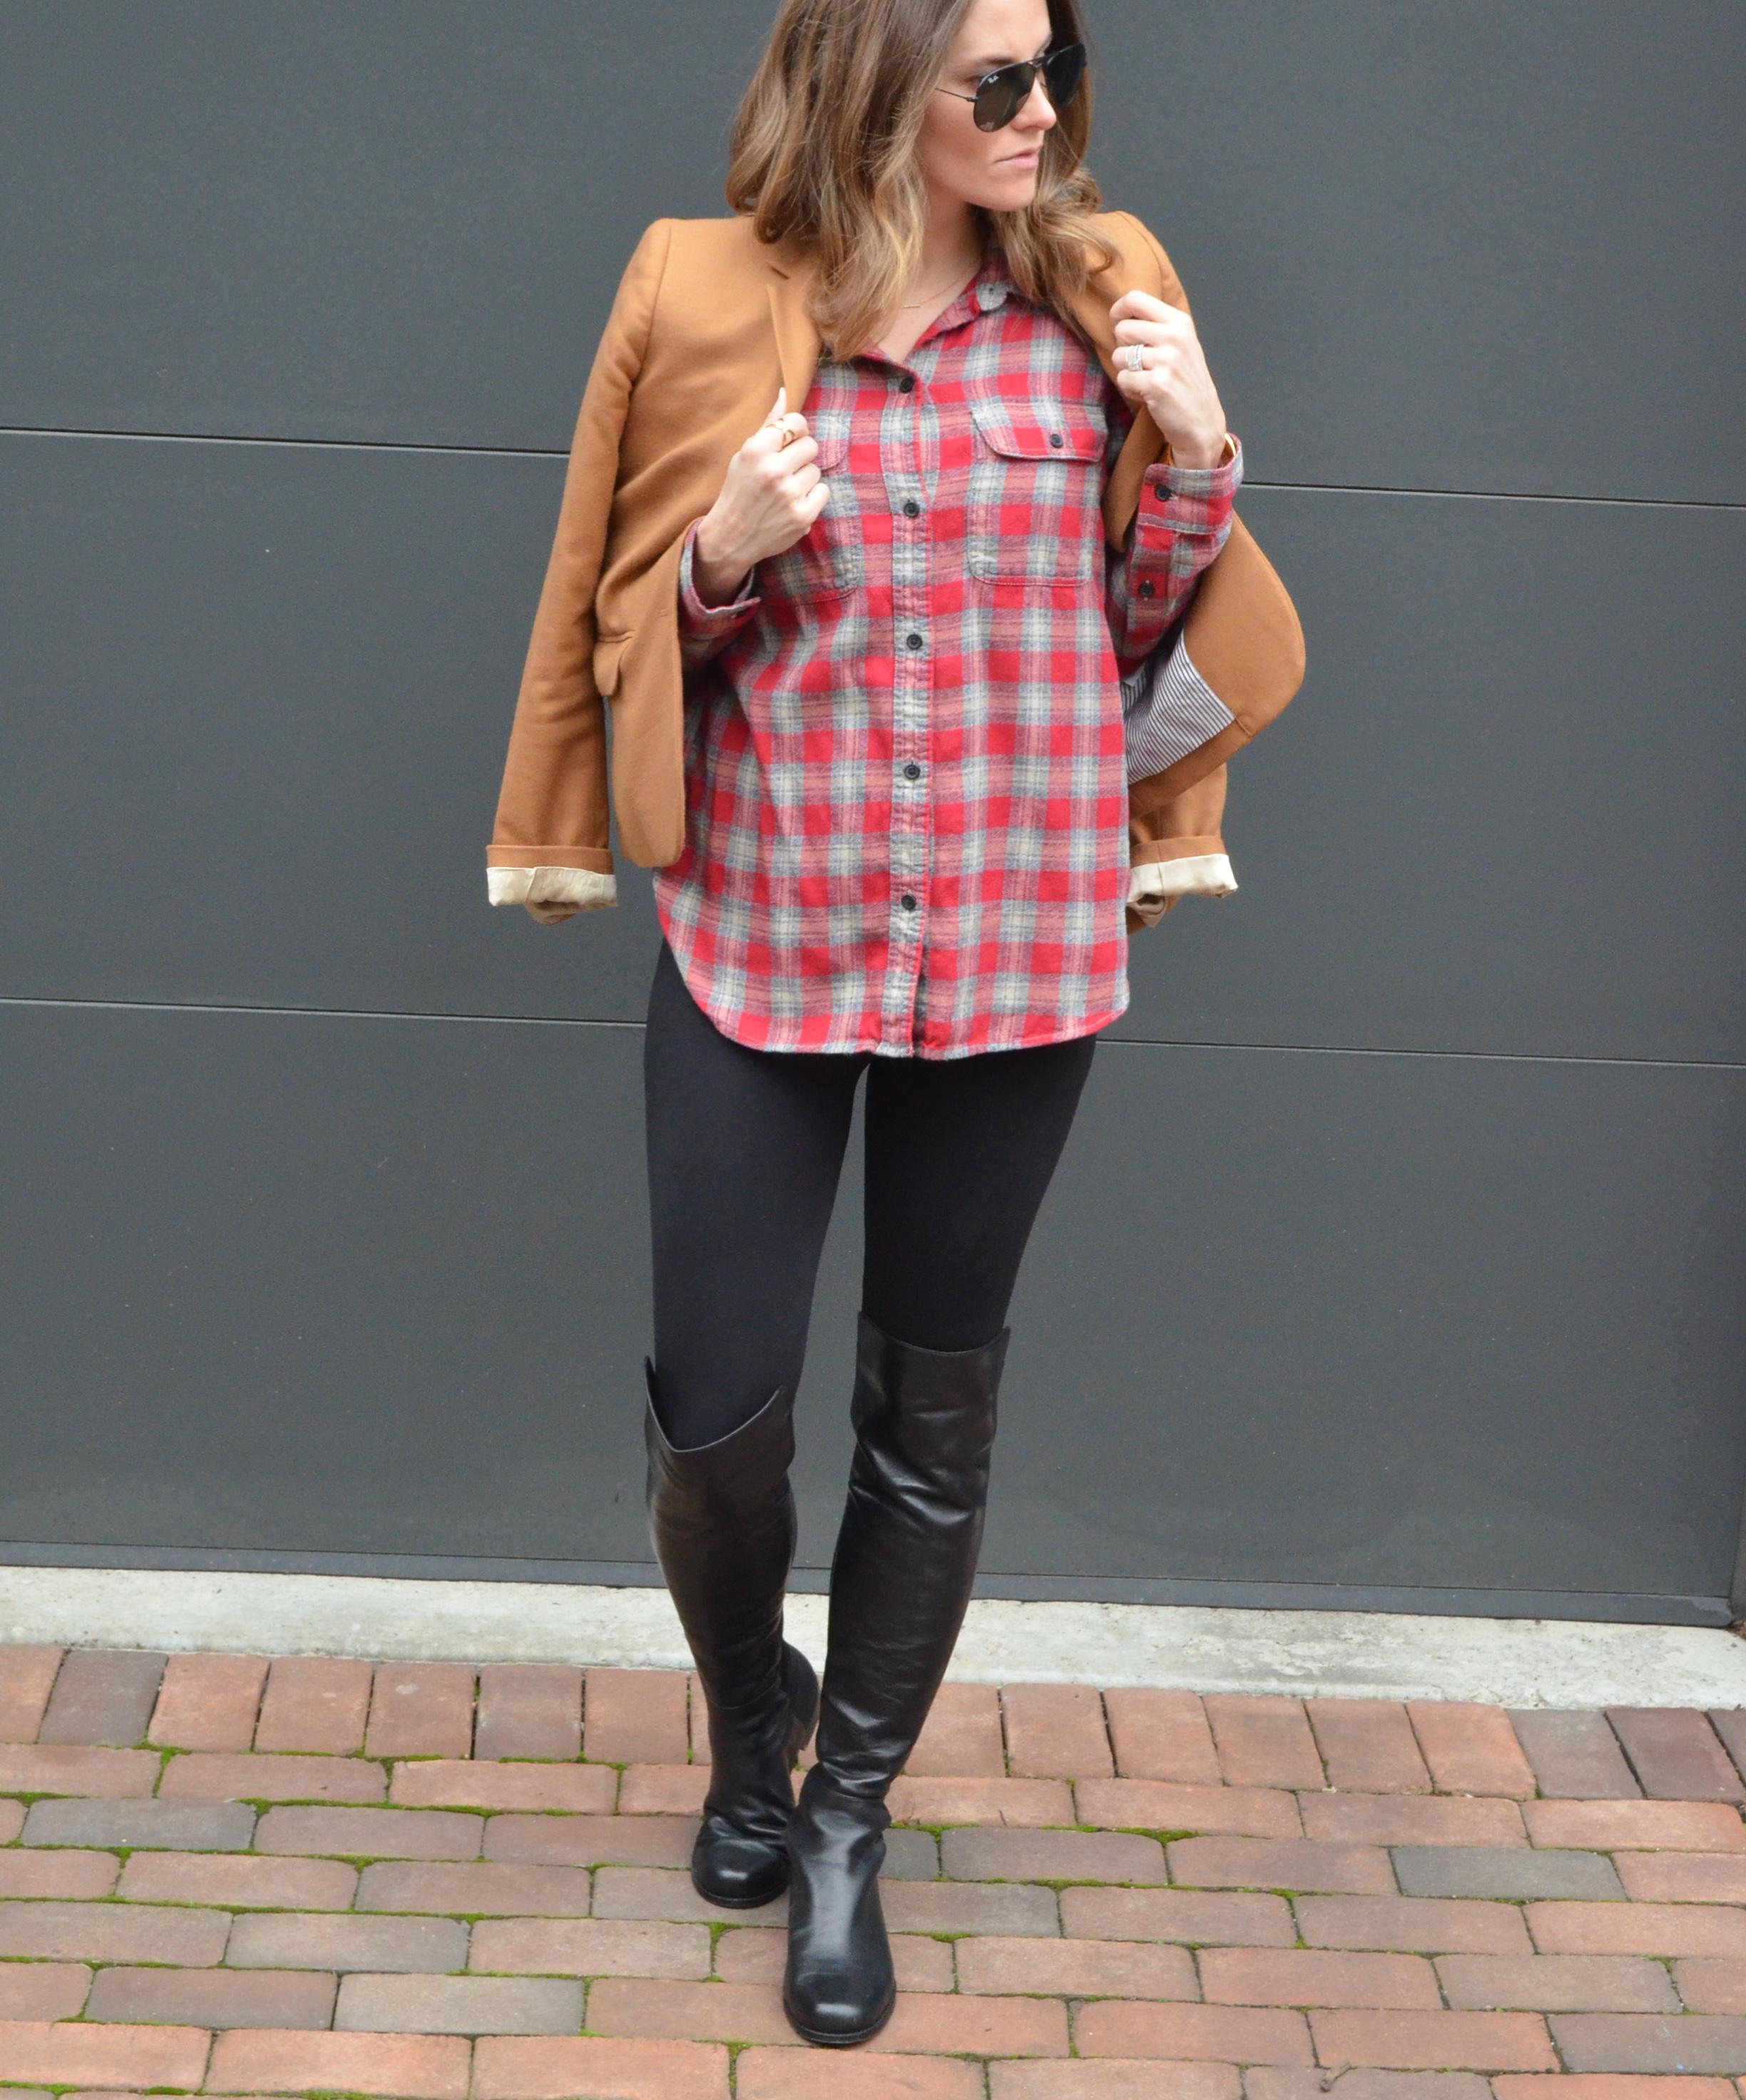 plaid stuart weitzman 5050 boots pregnant blogger maternity style